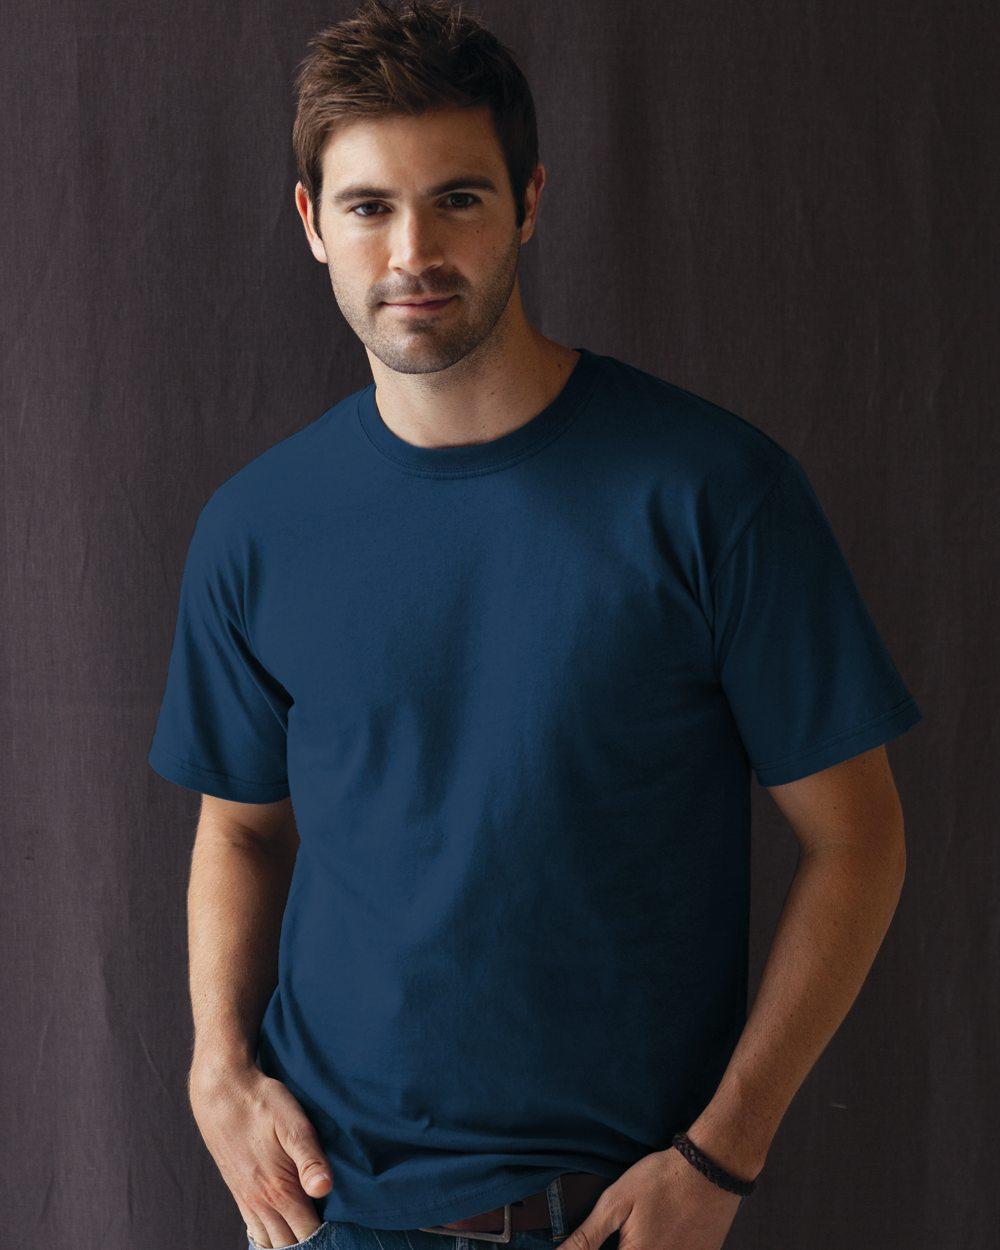 5ed471c6599d Standard Weight 100% Cotton T-Shirts (5.3 - 5.4oz). ANVIL 779